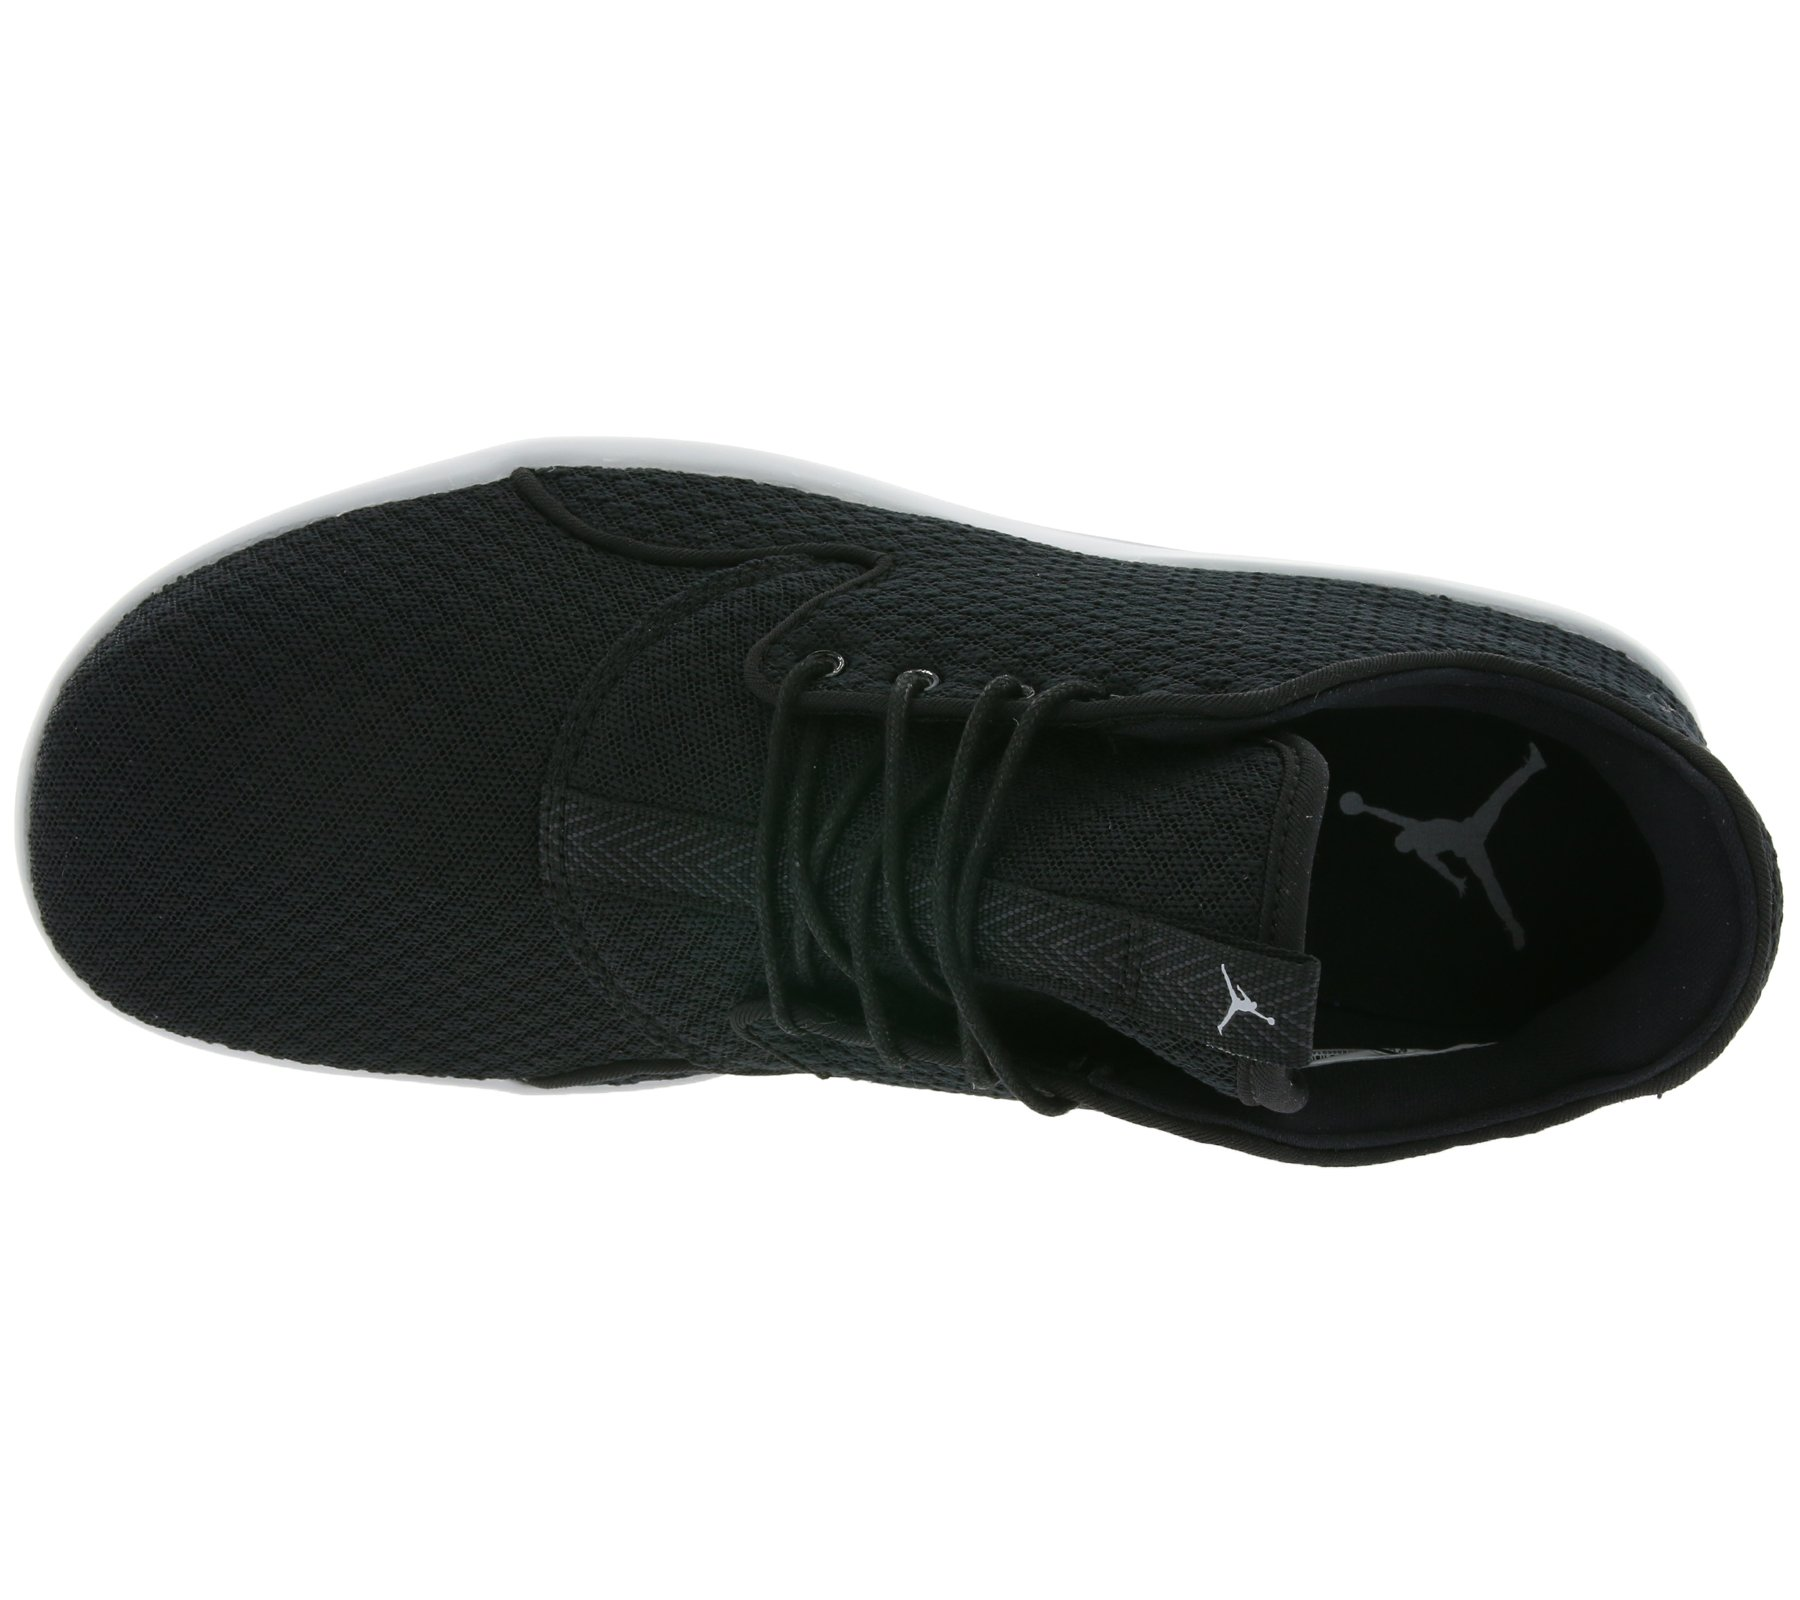 Nike Jordan Eclipse 724010-015 724010-015 Eur 40,5